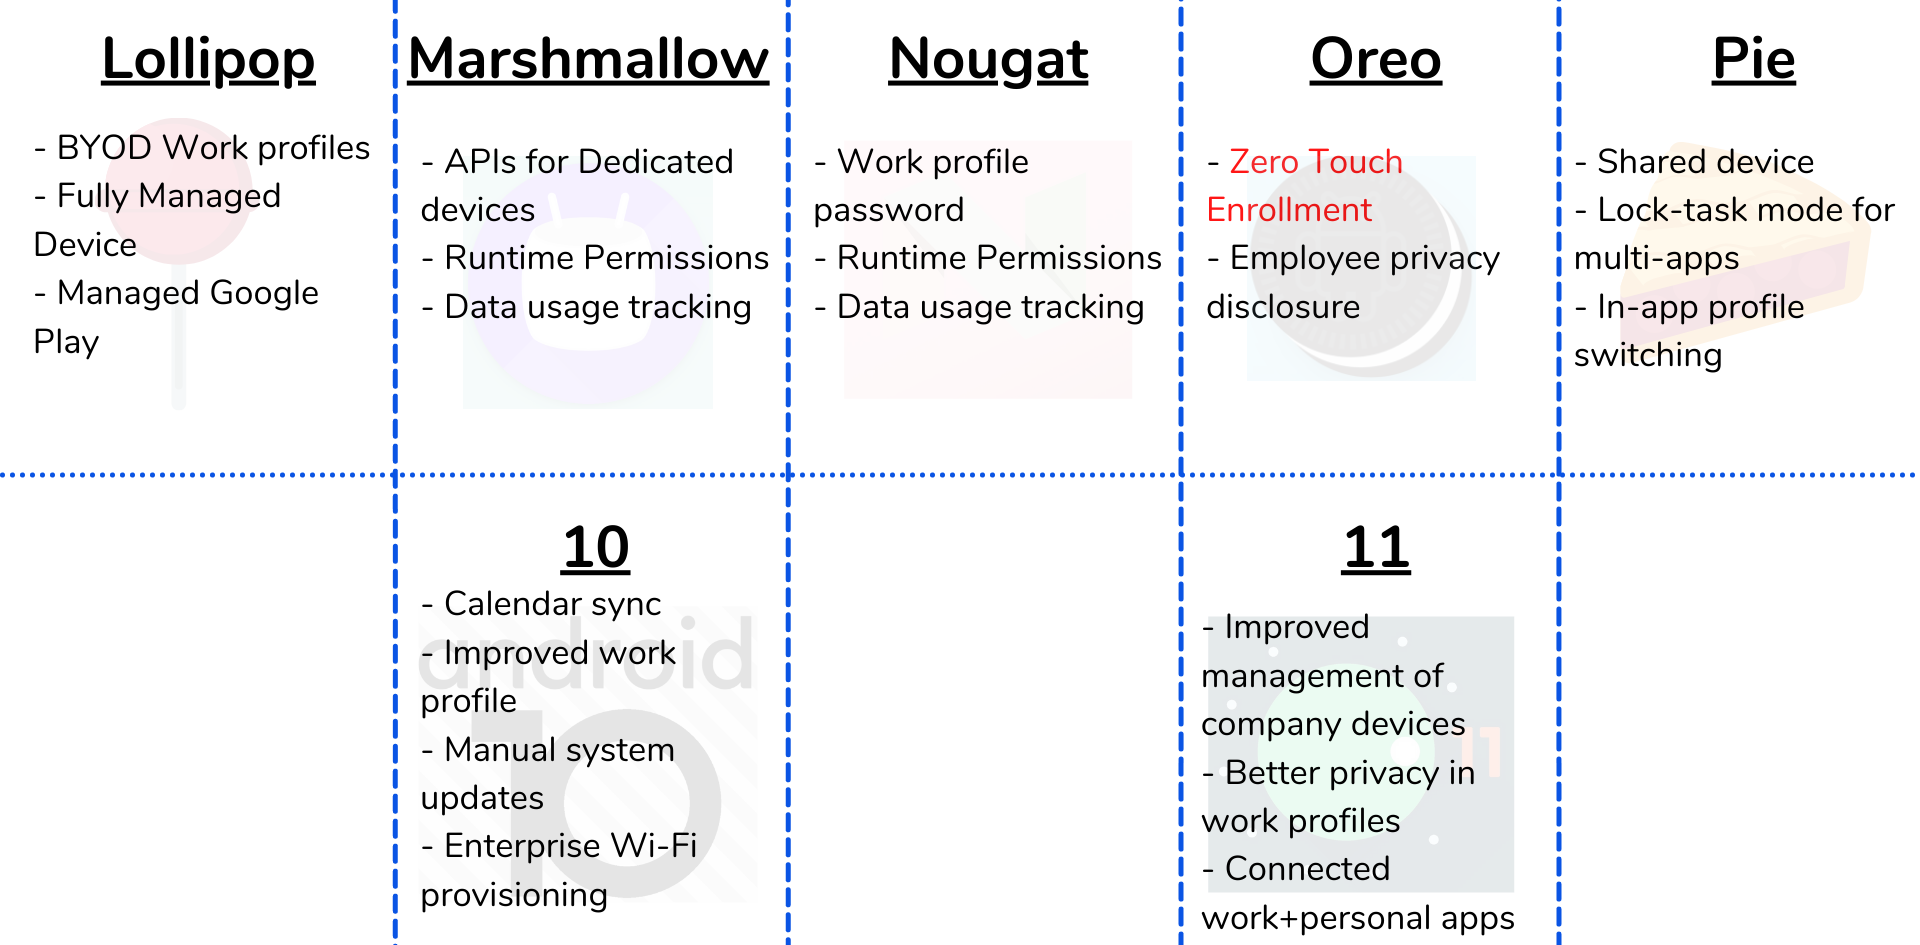 evolution of zero-touch enrollment